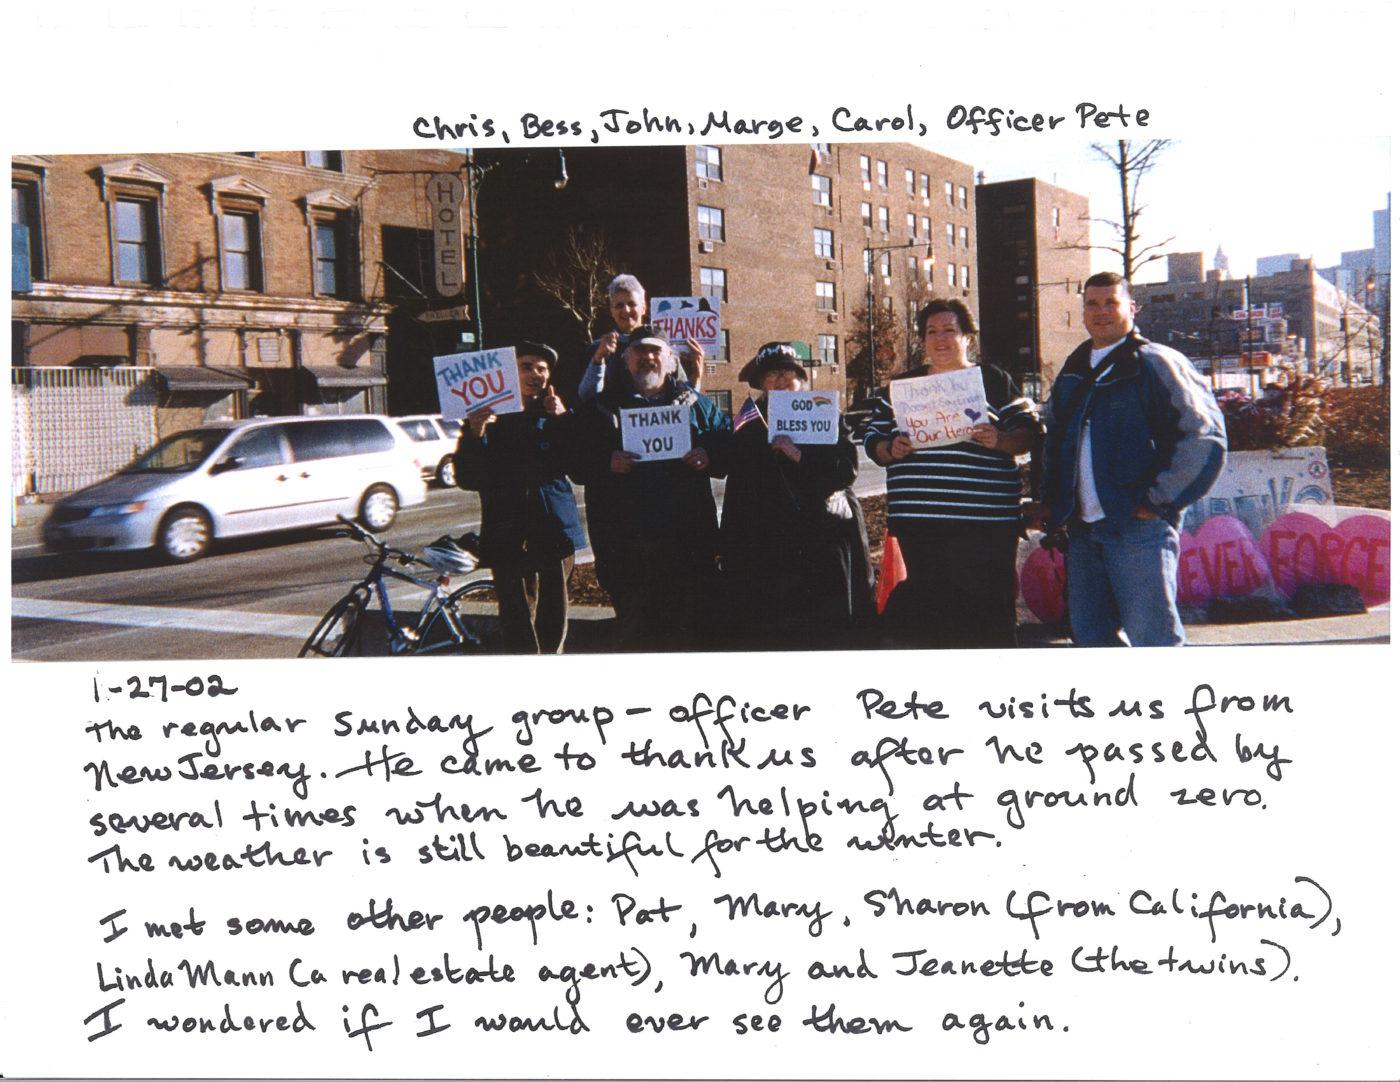 PTY Regular Crew- Chris, Bess, Carol, Marge, John, and officer Peter